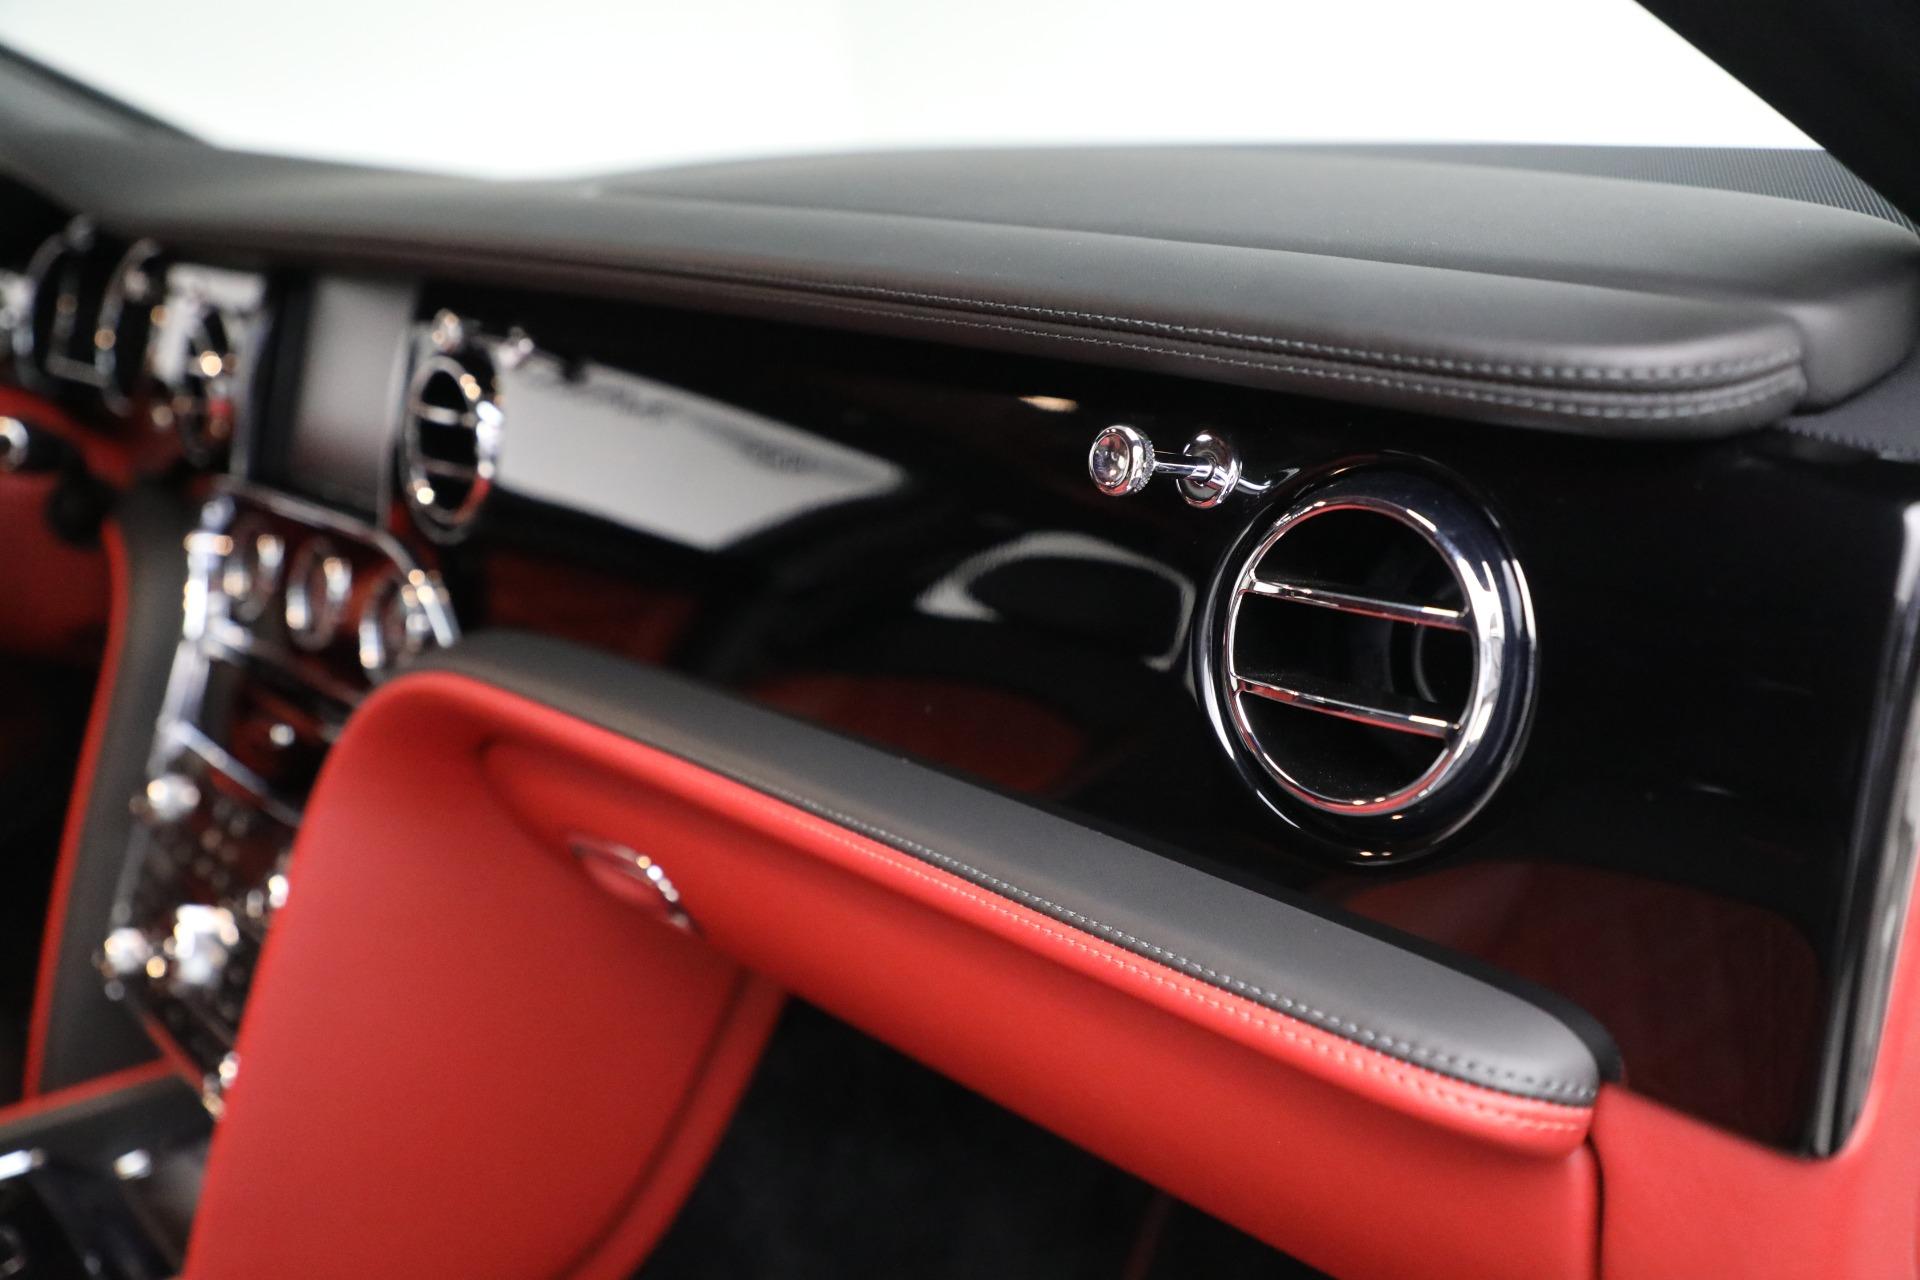 Used 2018 Bentley Mulsanne Speed For Sale In Westport, CT 2075_p30